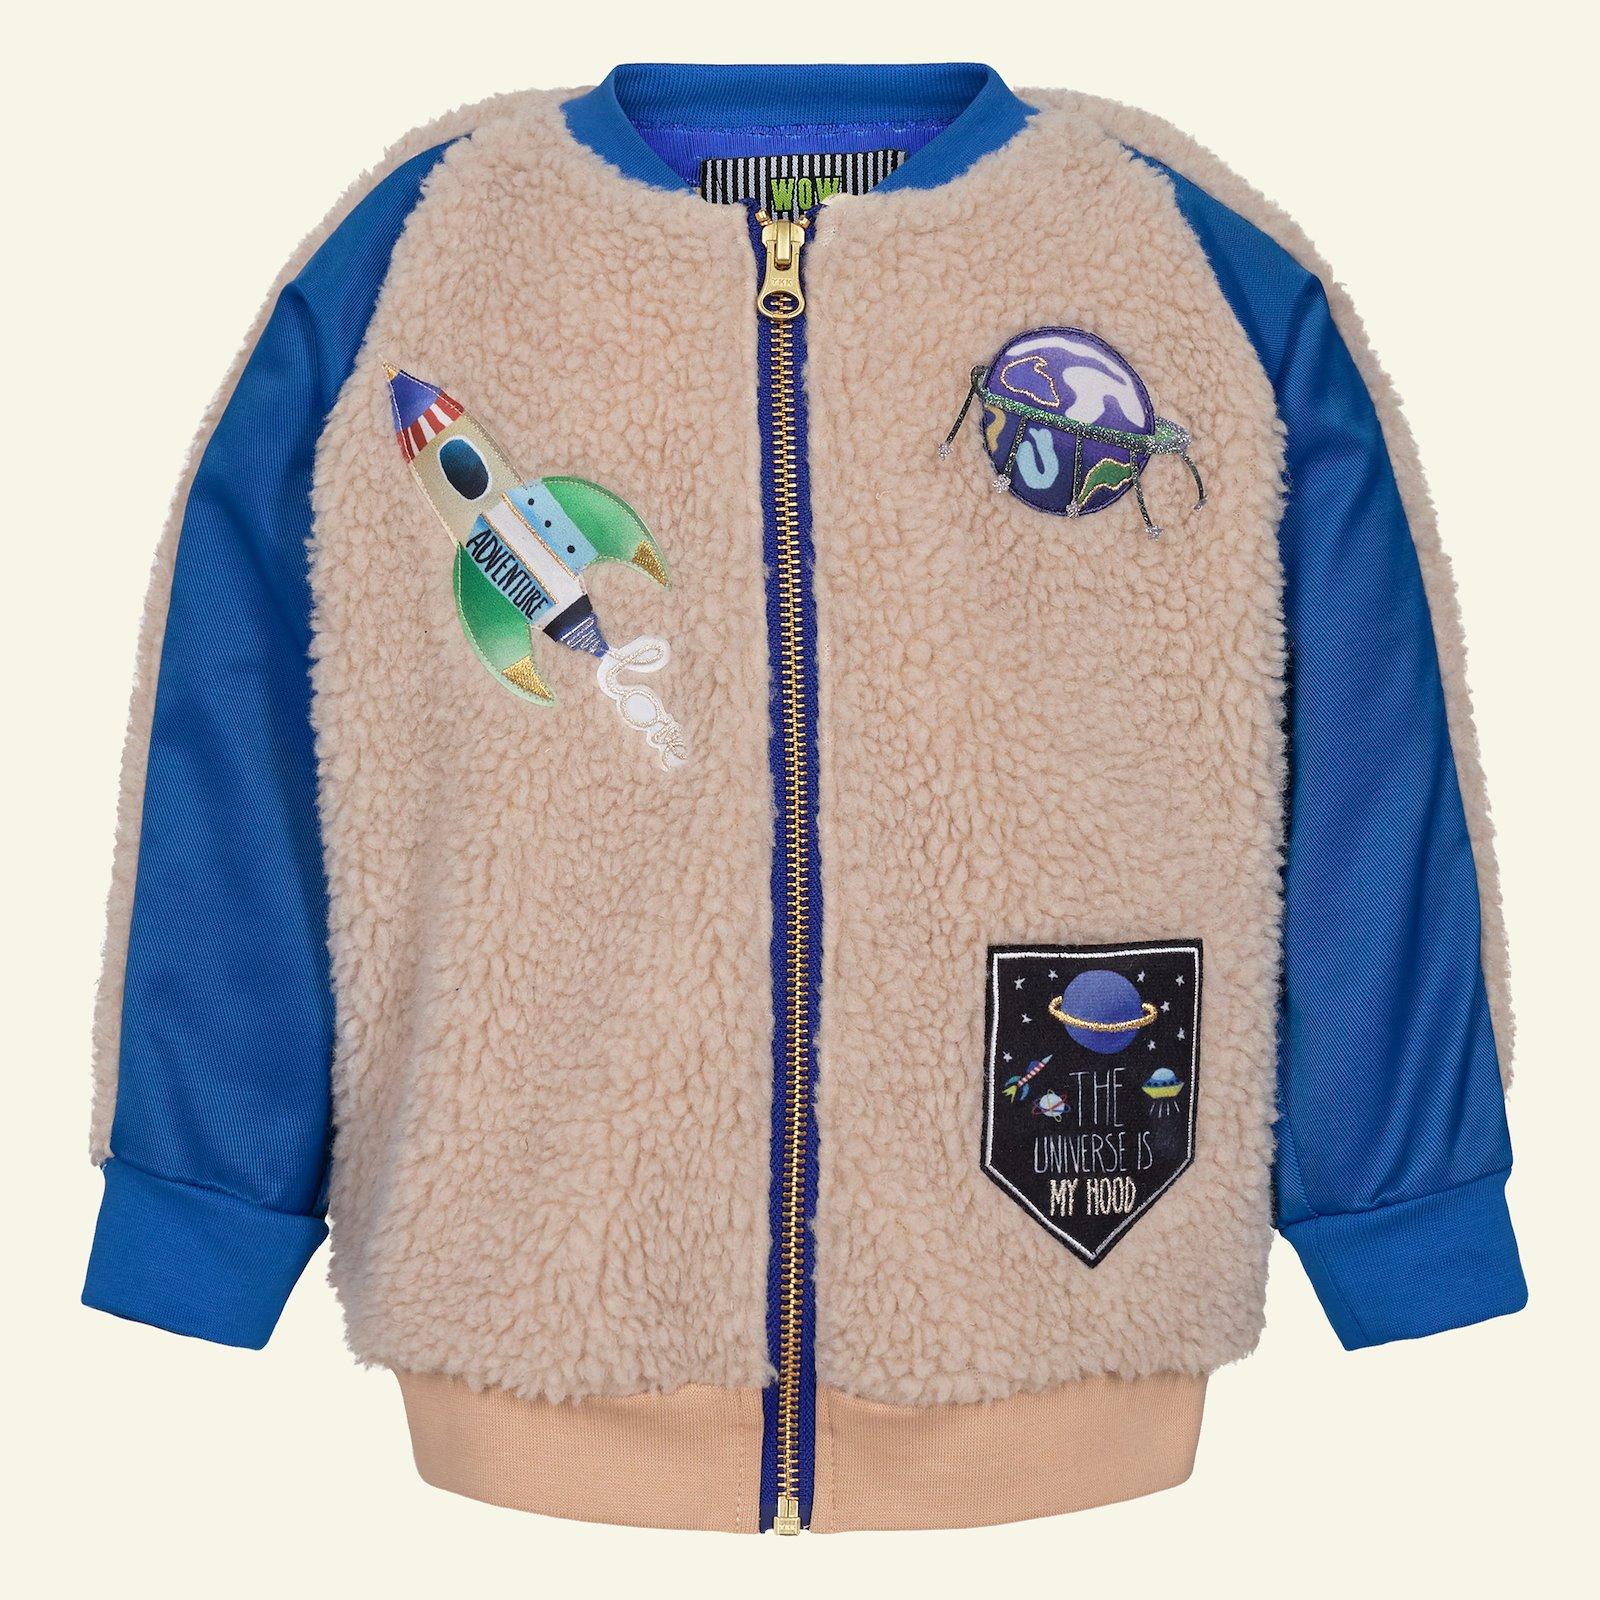 Bomber jacket, 98/3y p84002_450021_910273_230604_26461_26463_sskit